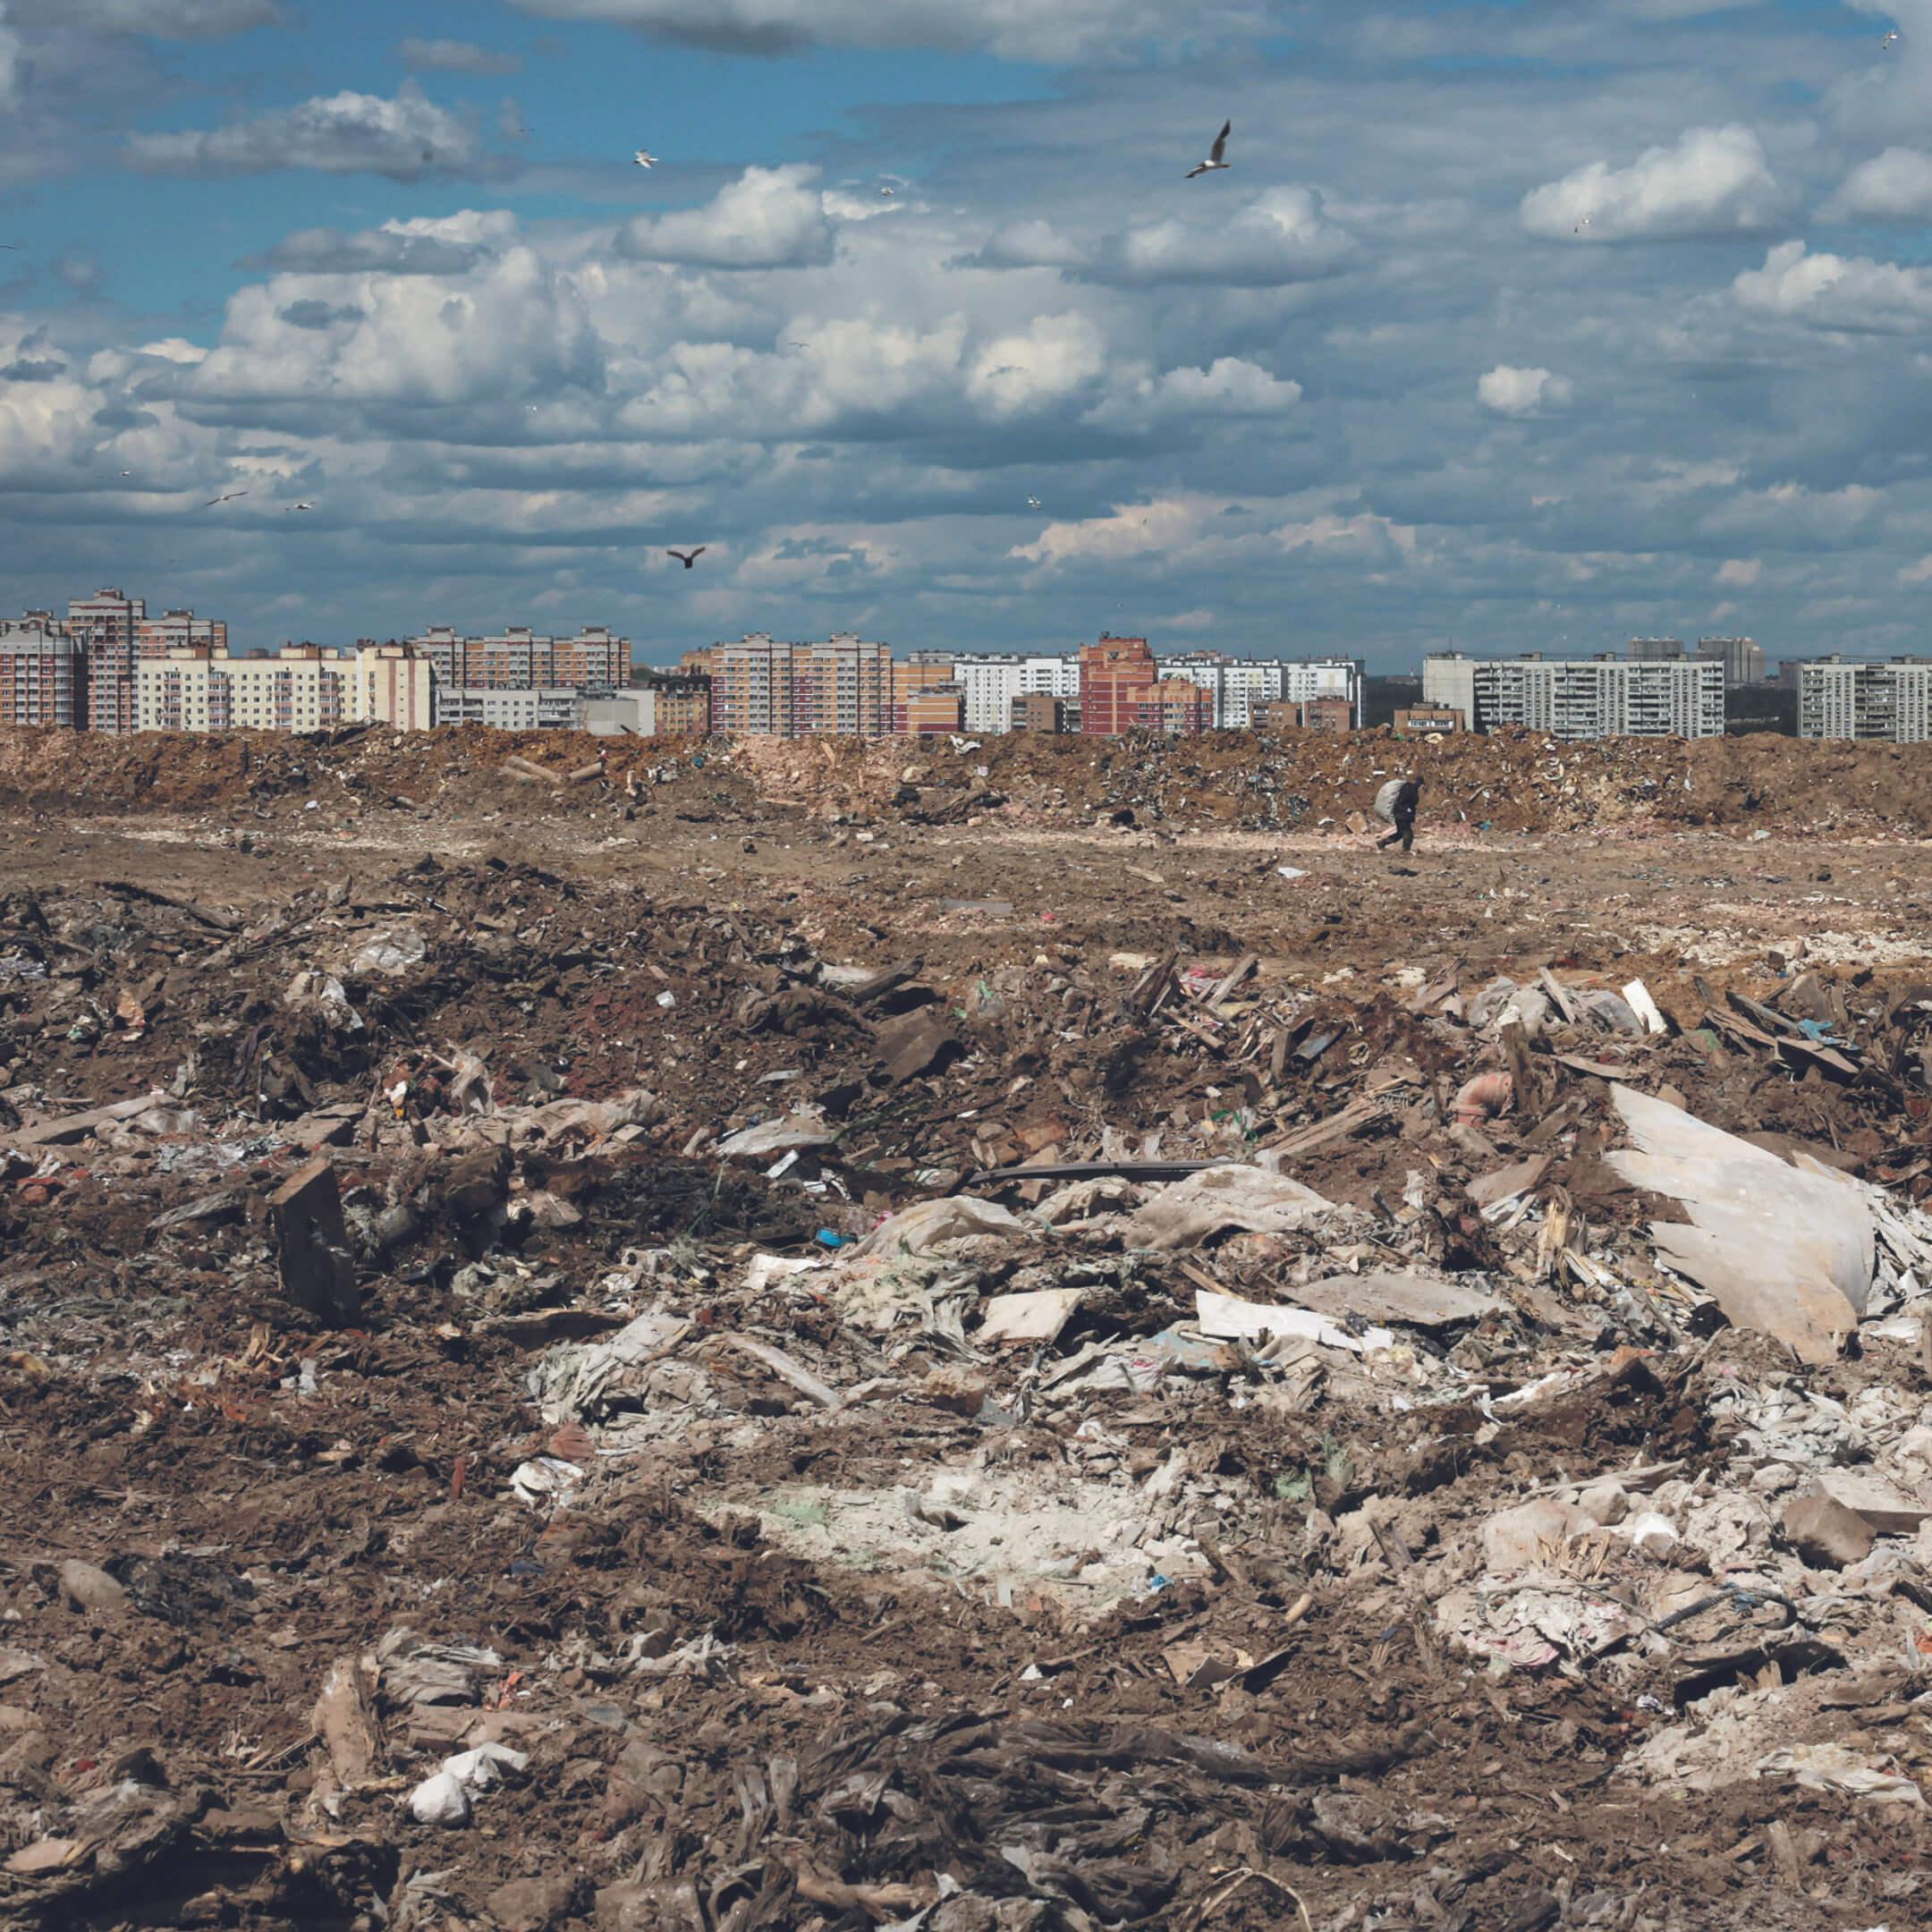 Фото изкниги «Страна отходов». Свалка «Кучино» вБалашихе, фотограф Катя Балабан